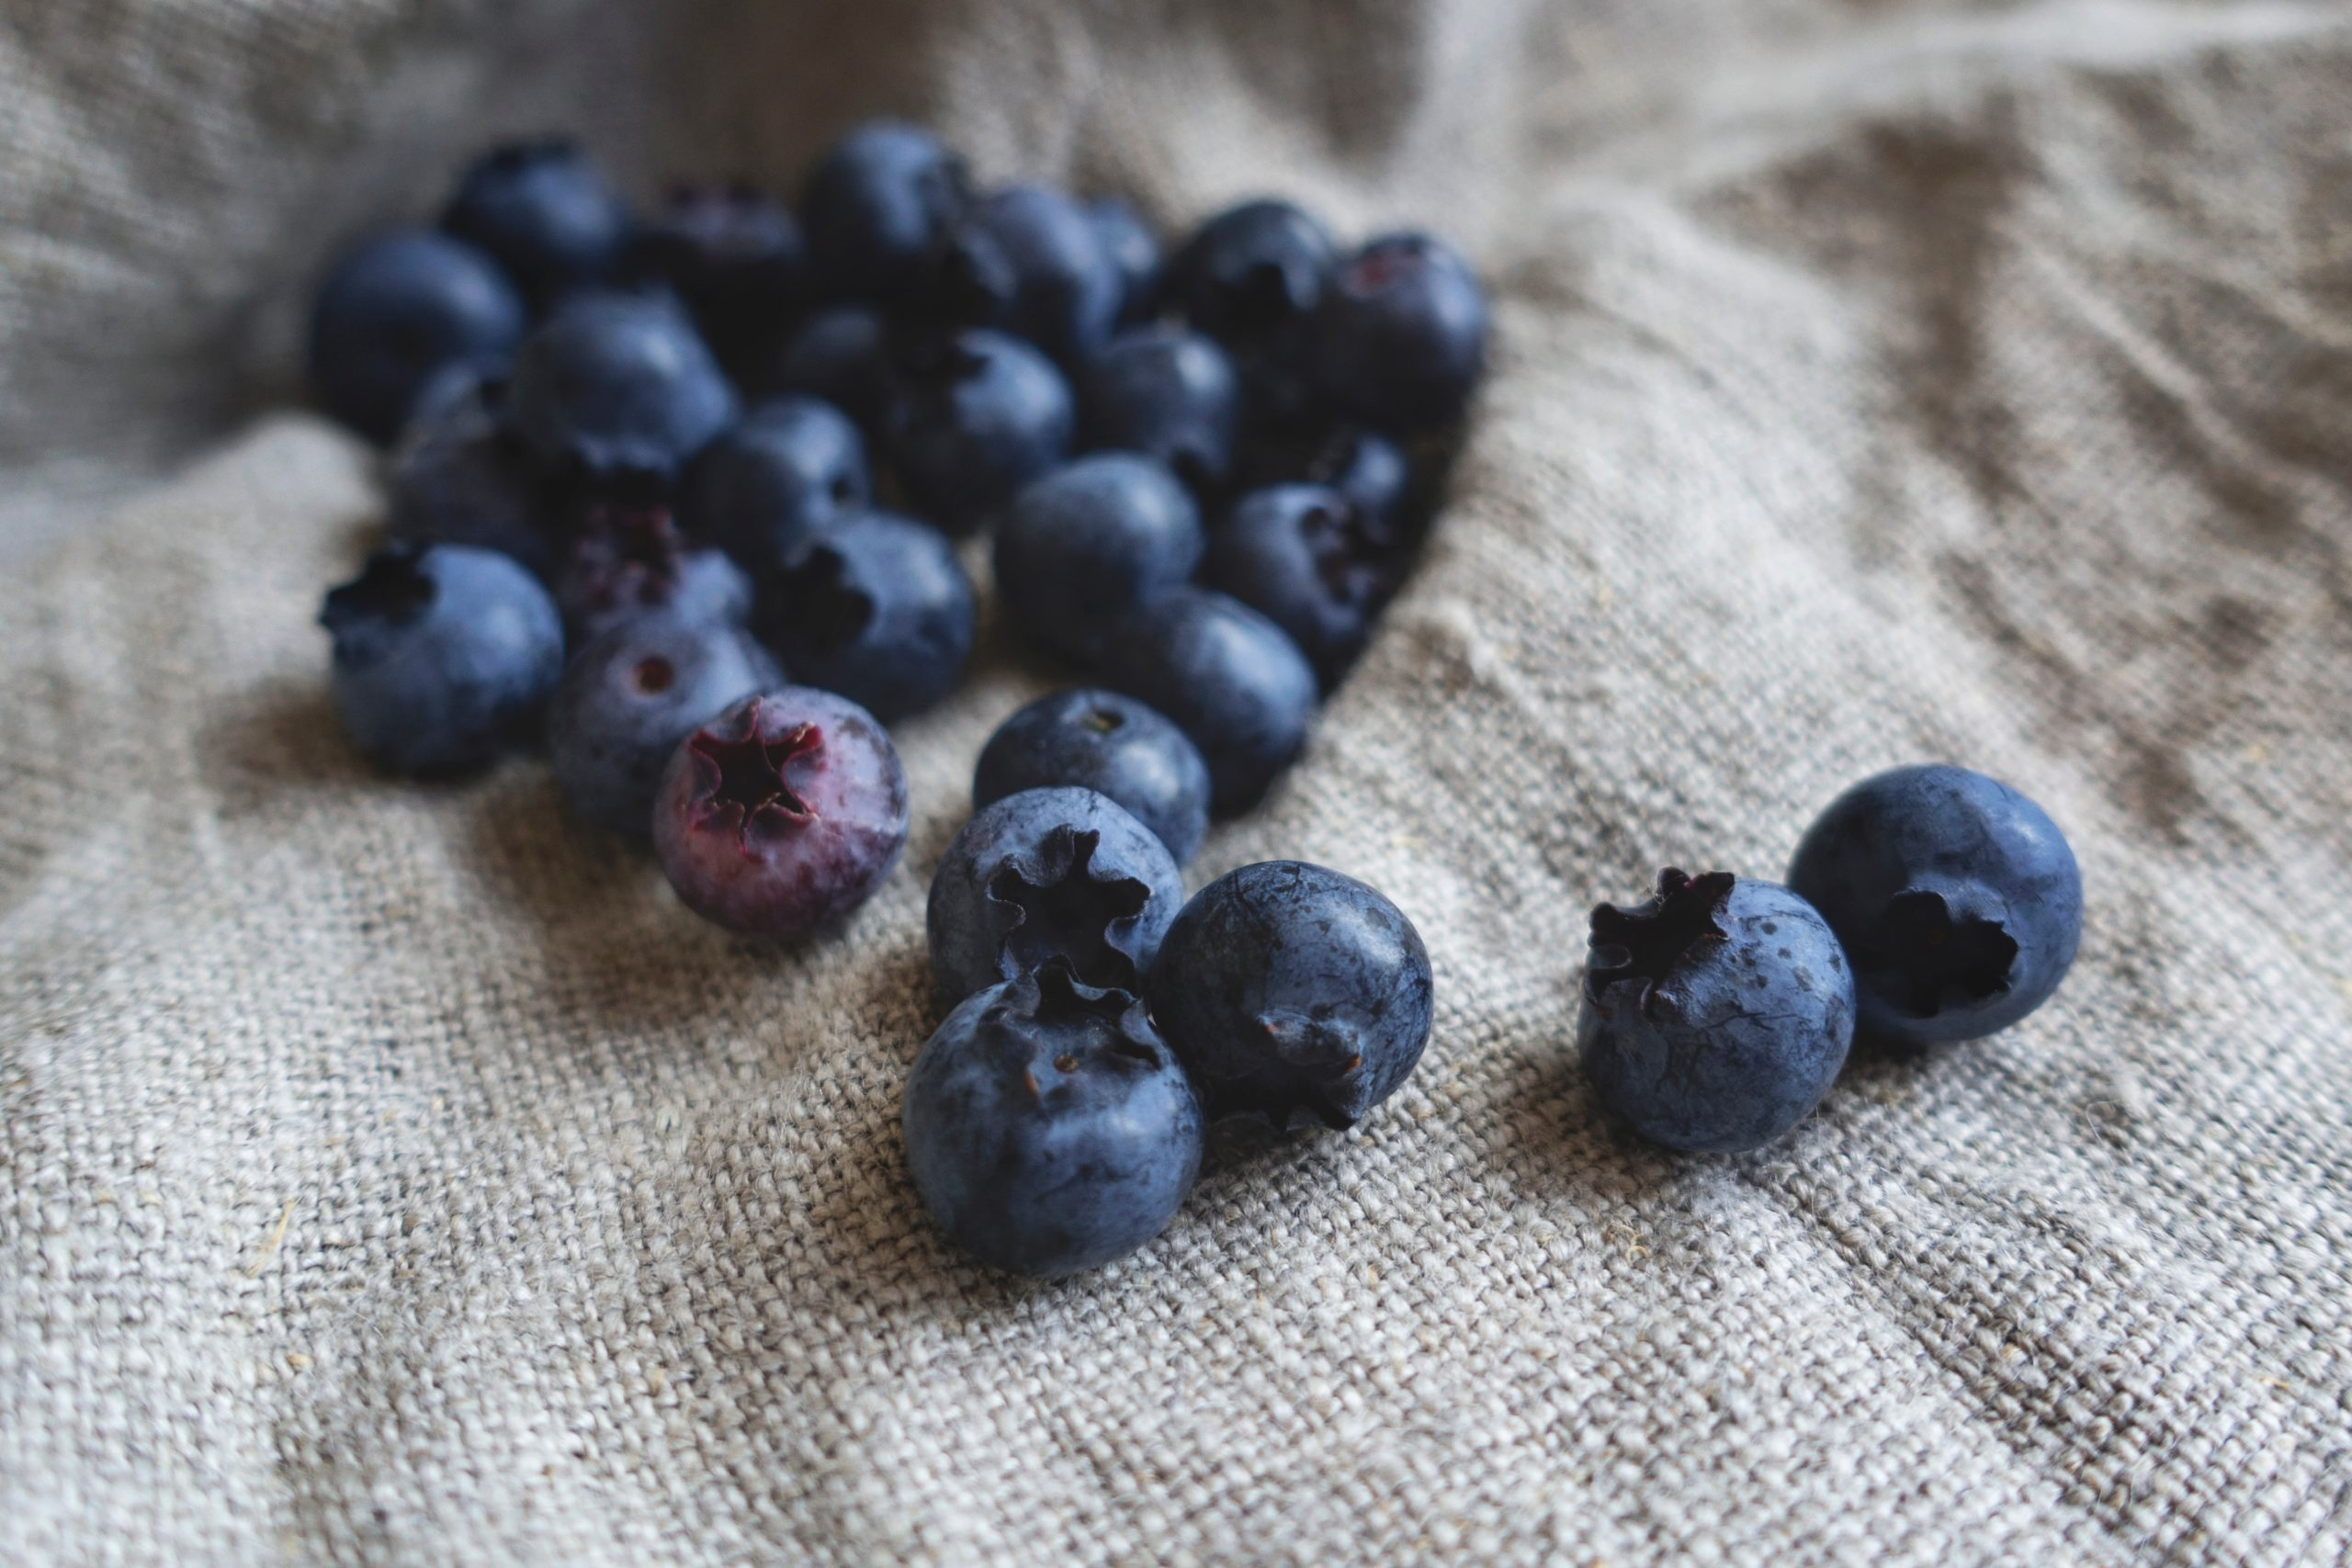 Coffee has more antioxidants than blueberries